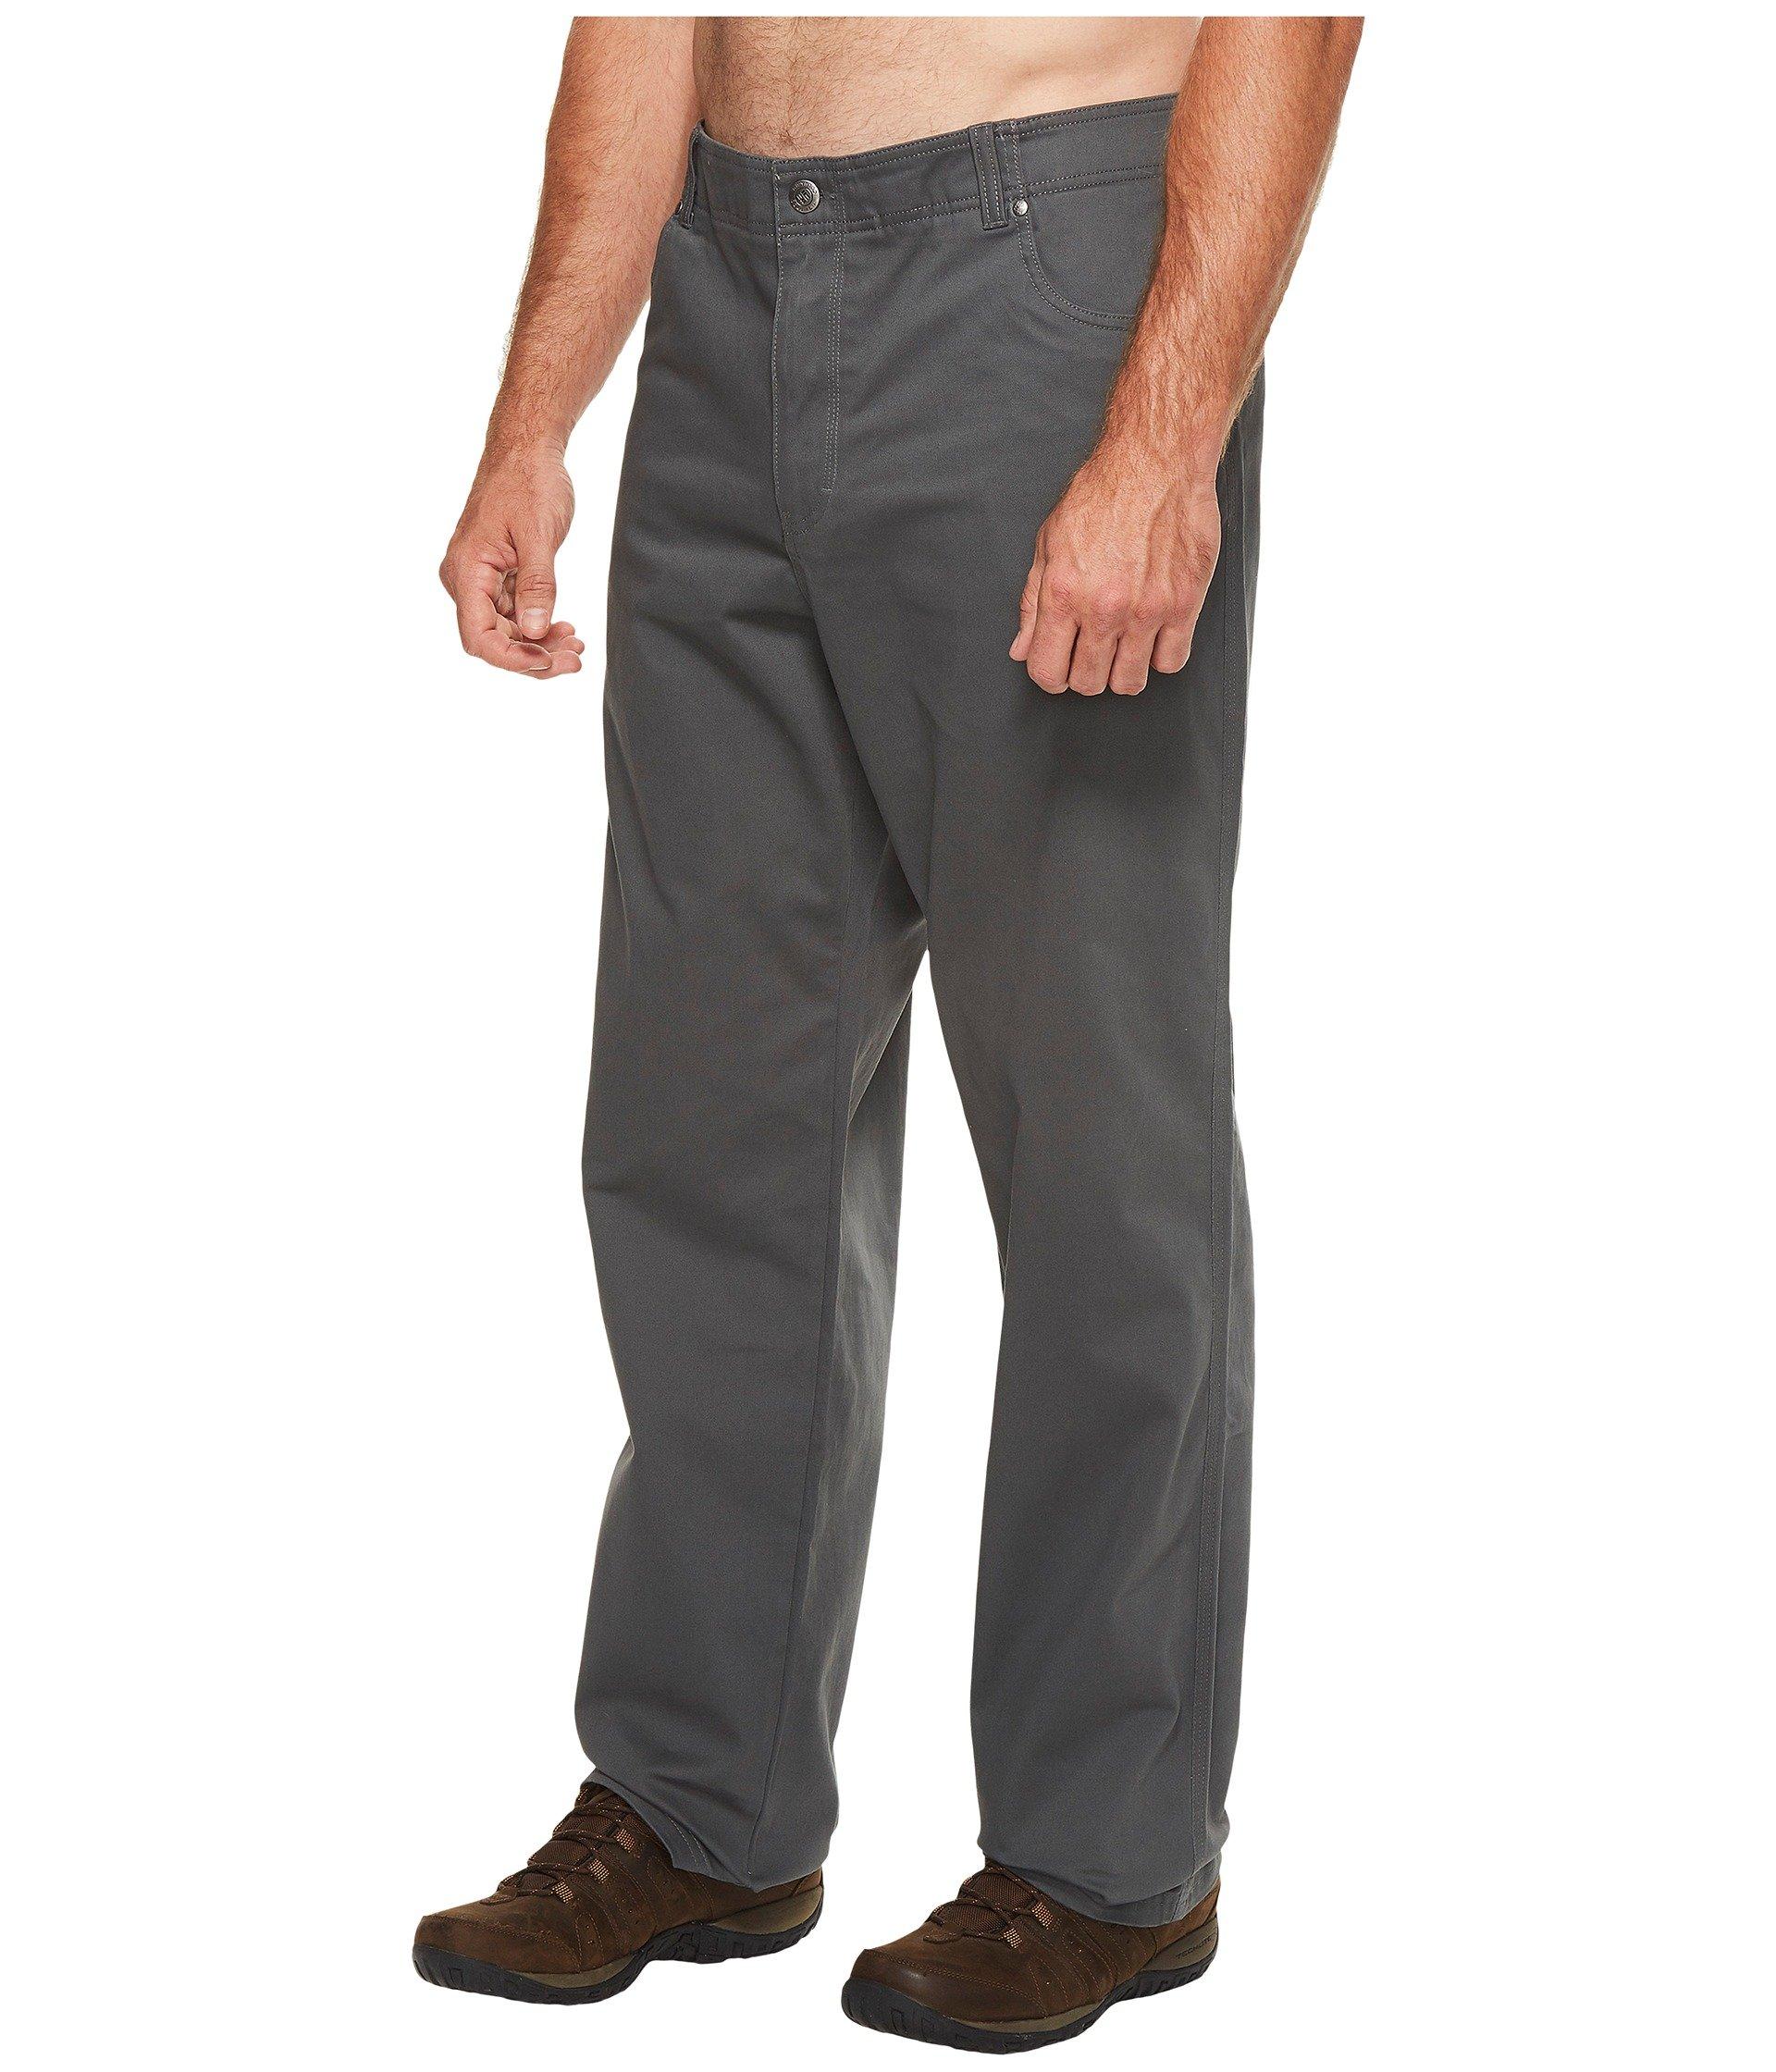 pocket Tall Pants Pilot Five Grill amp; Big Peak Columbia 1wYgY